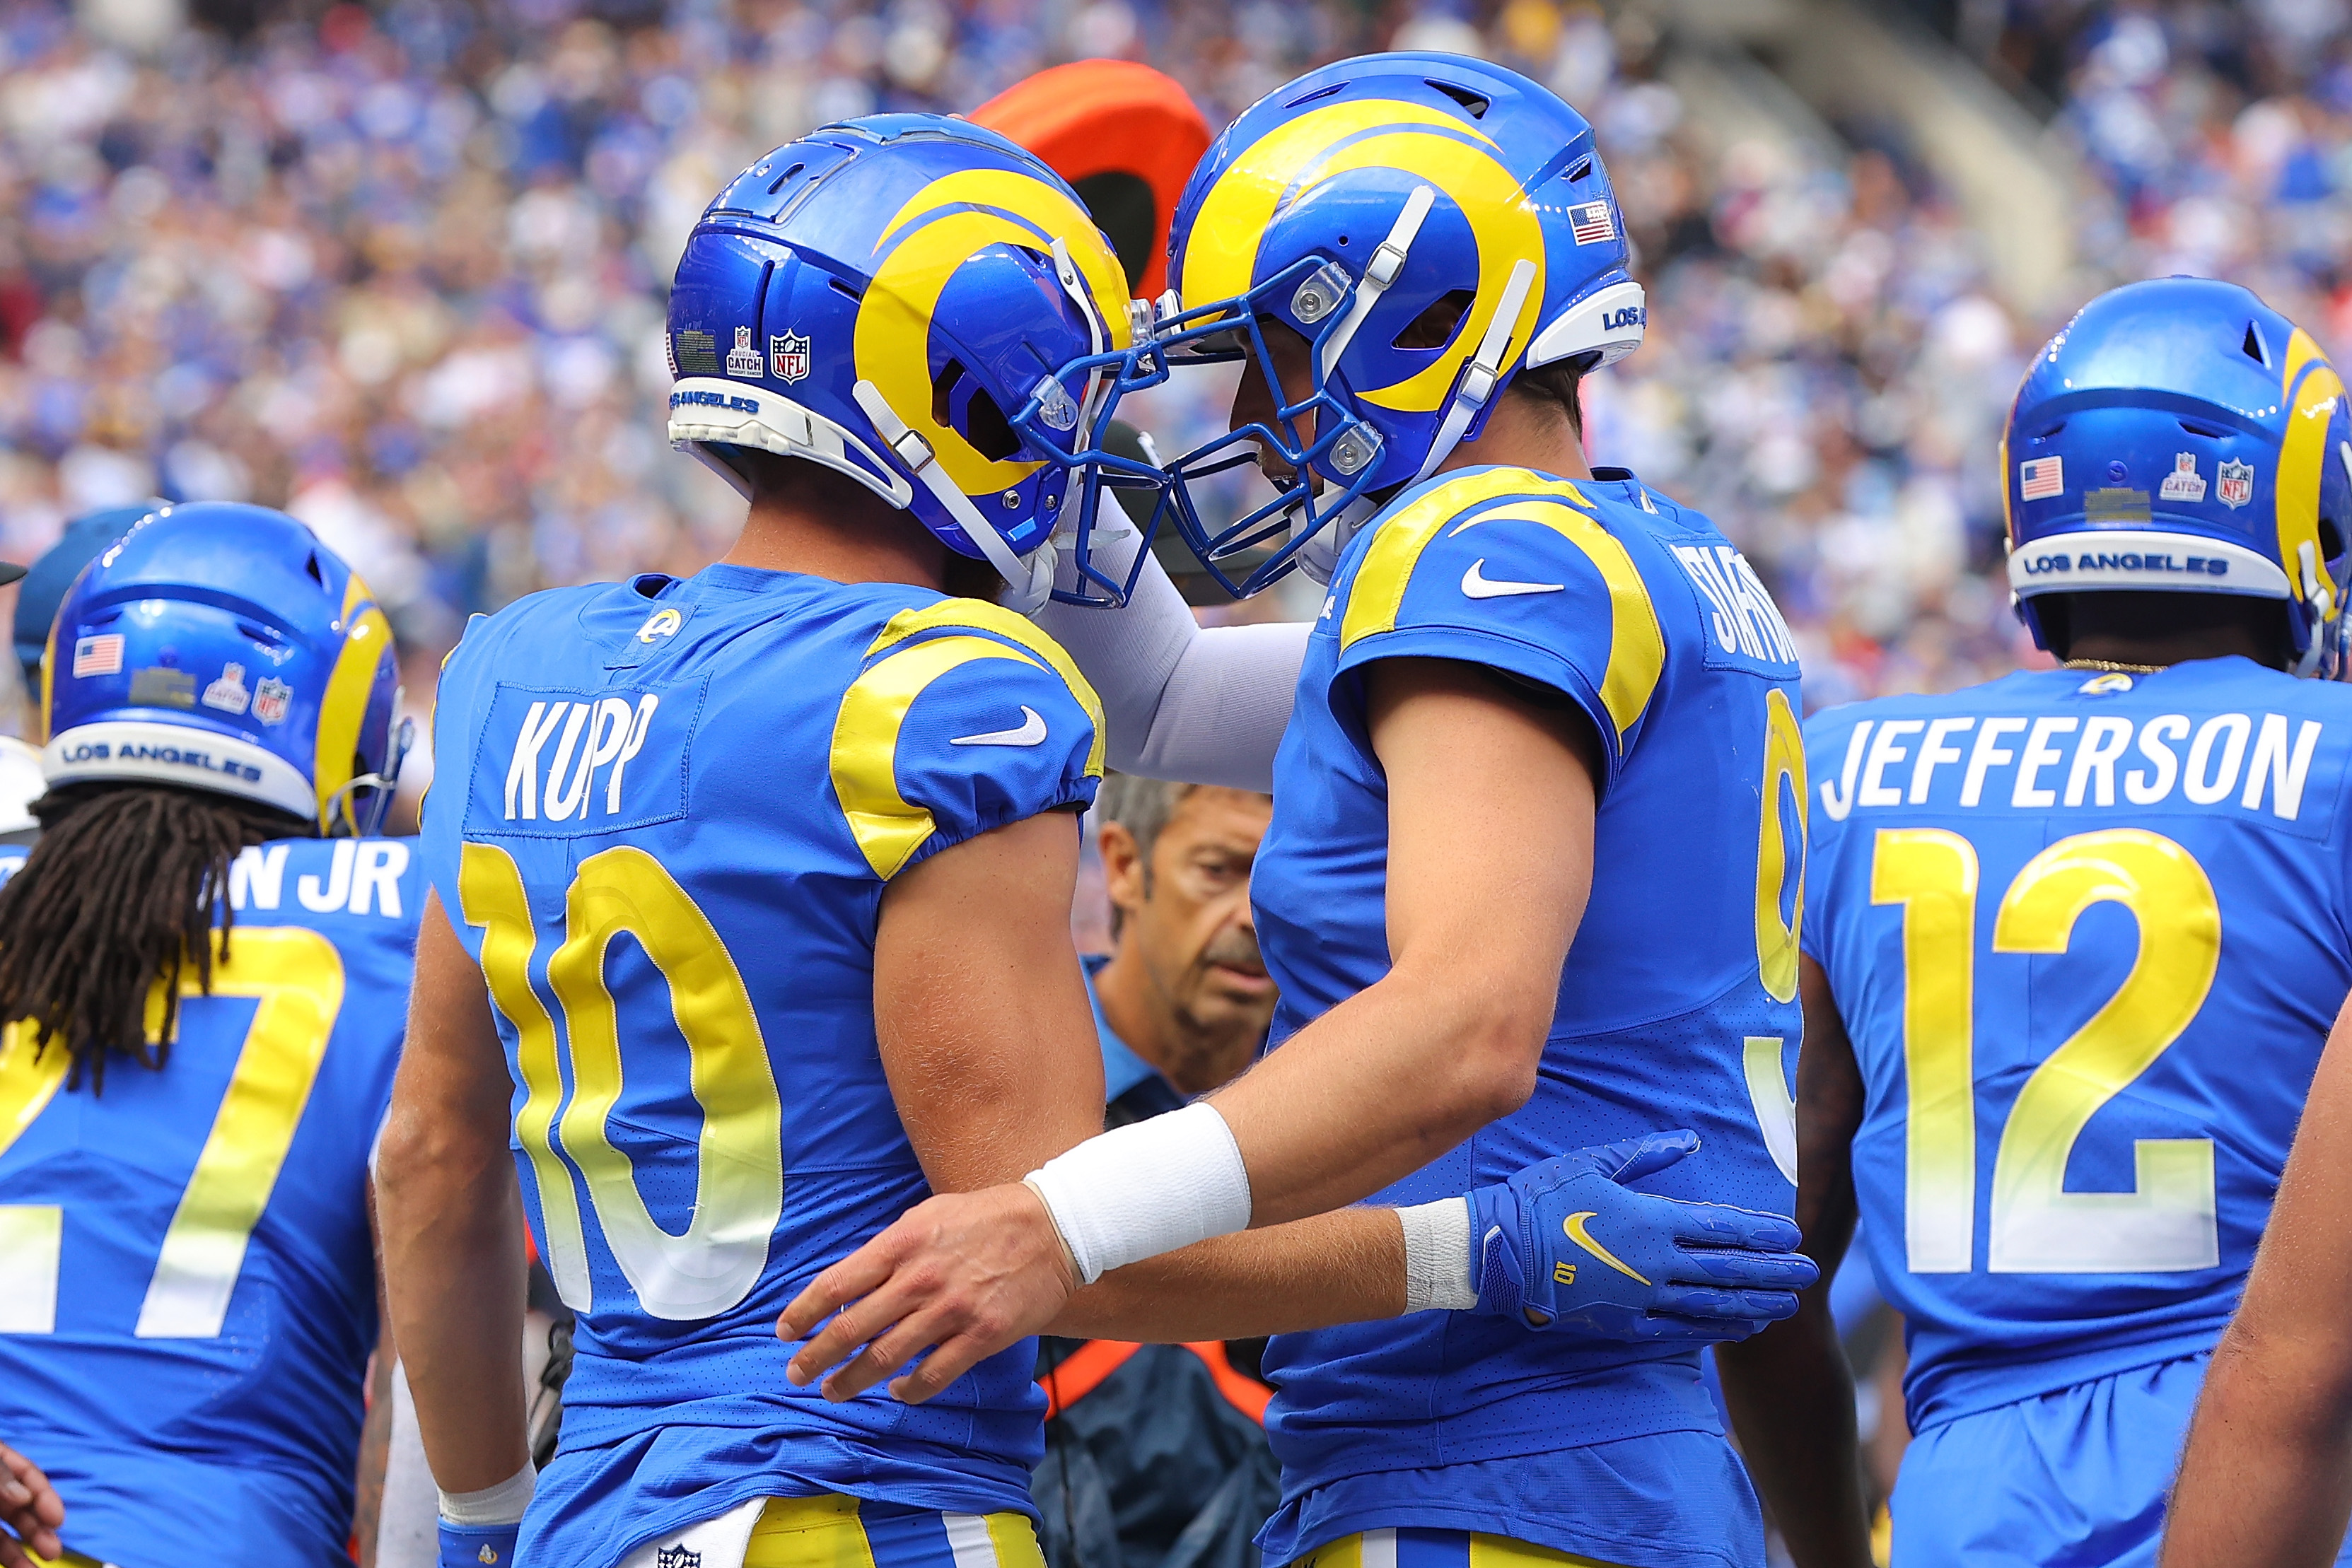 Los Angeles Rams v New York Giants